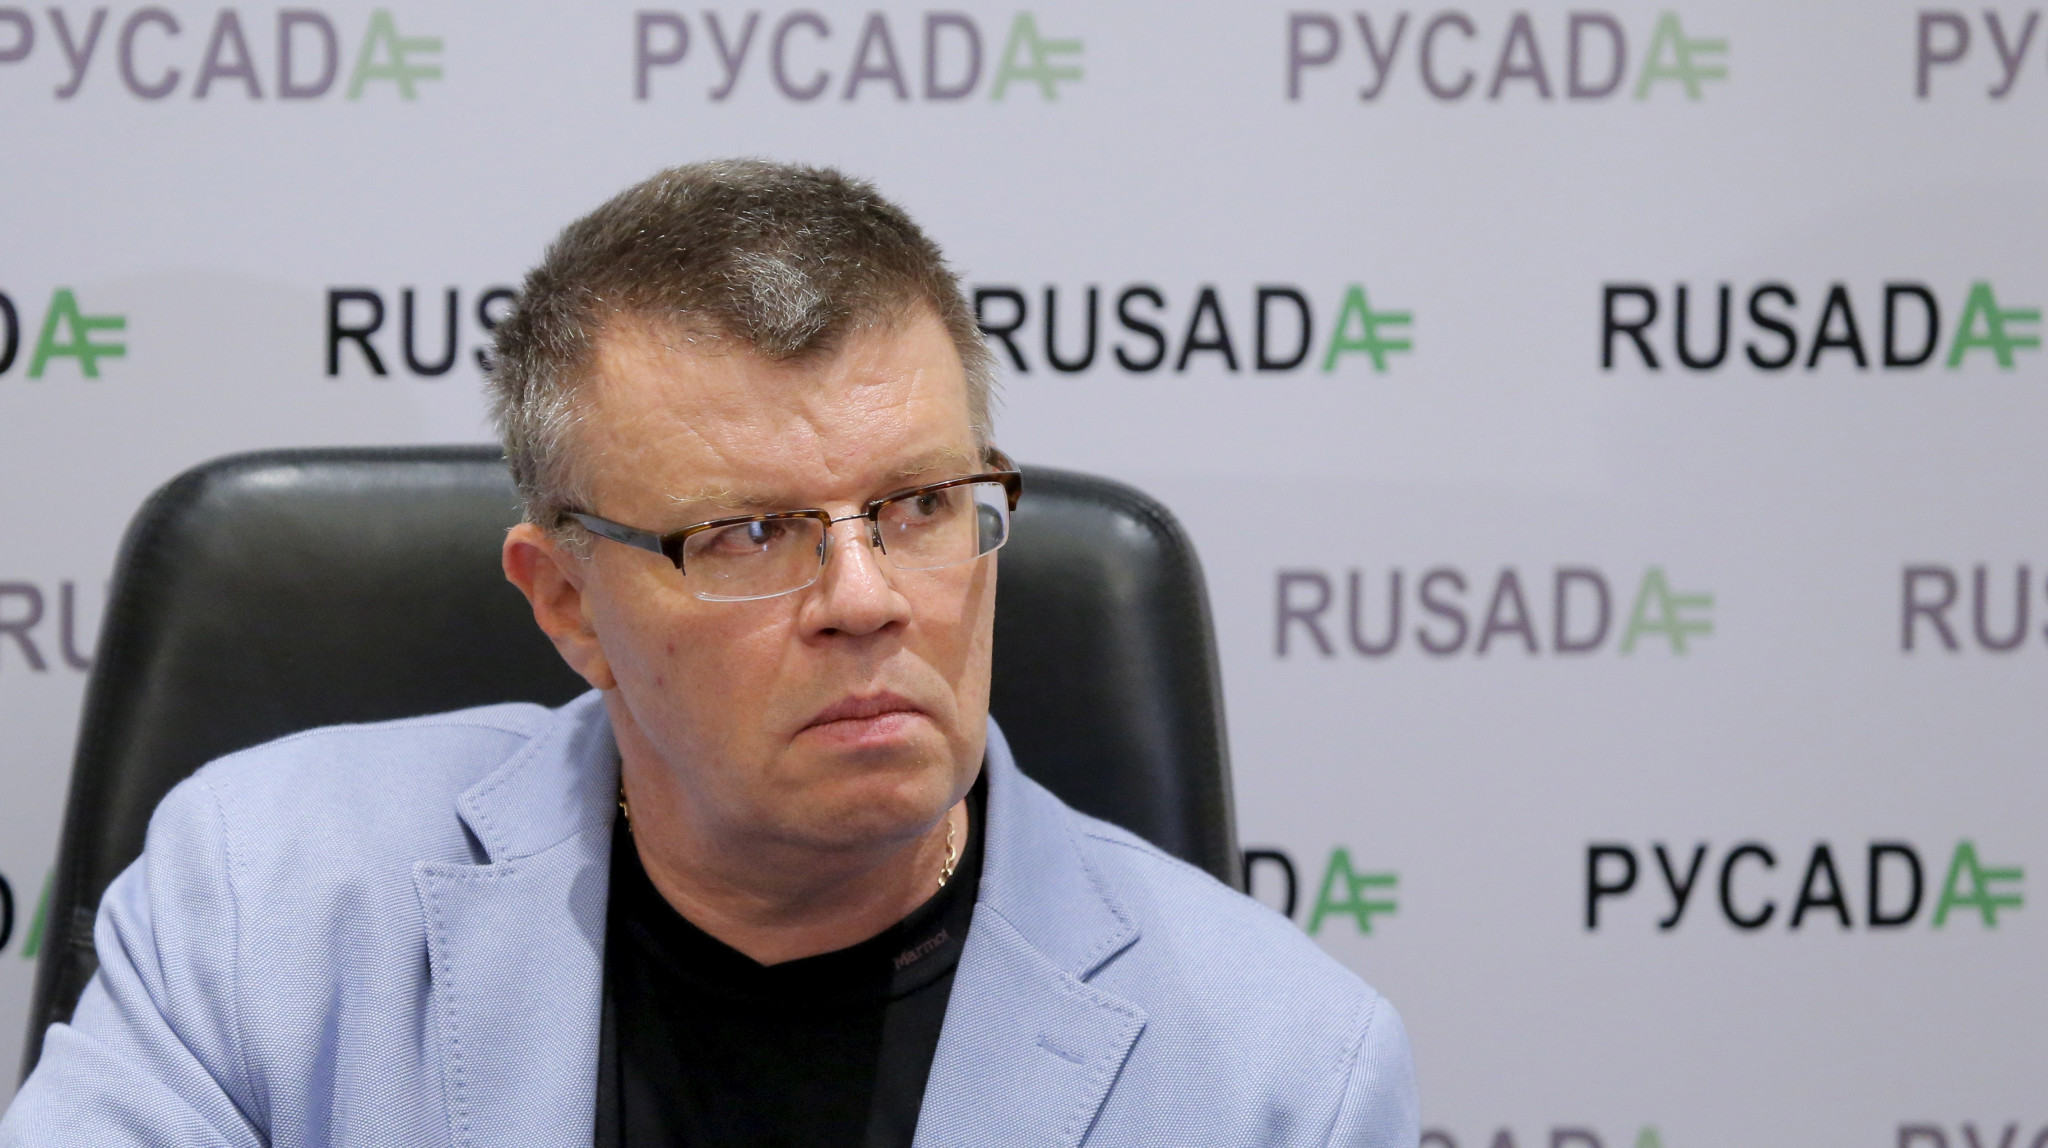 Nikita Kamaev, a predecessor of Yuriy Ganus as head of RUSADA, died of a